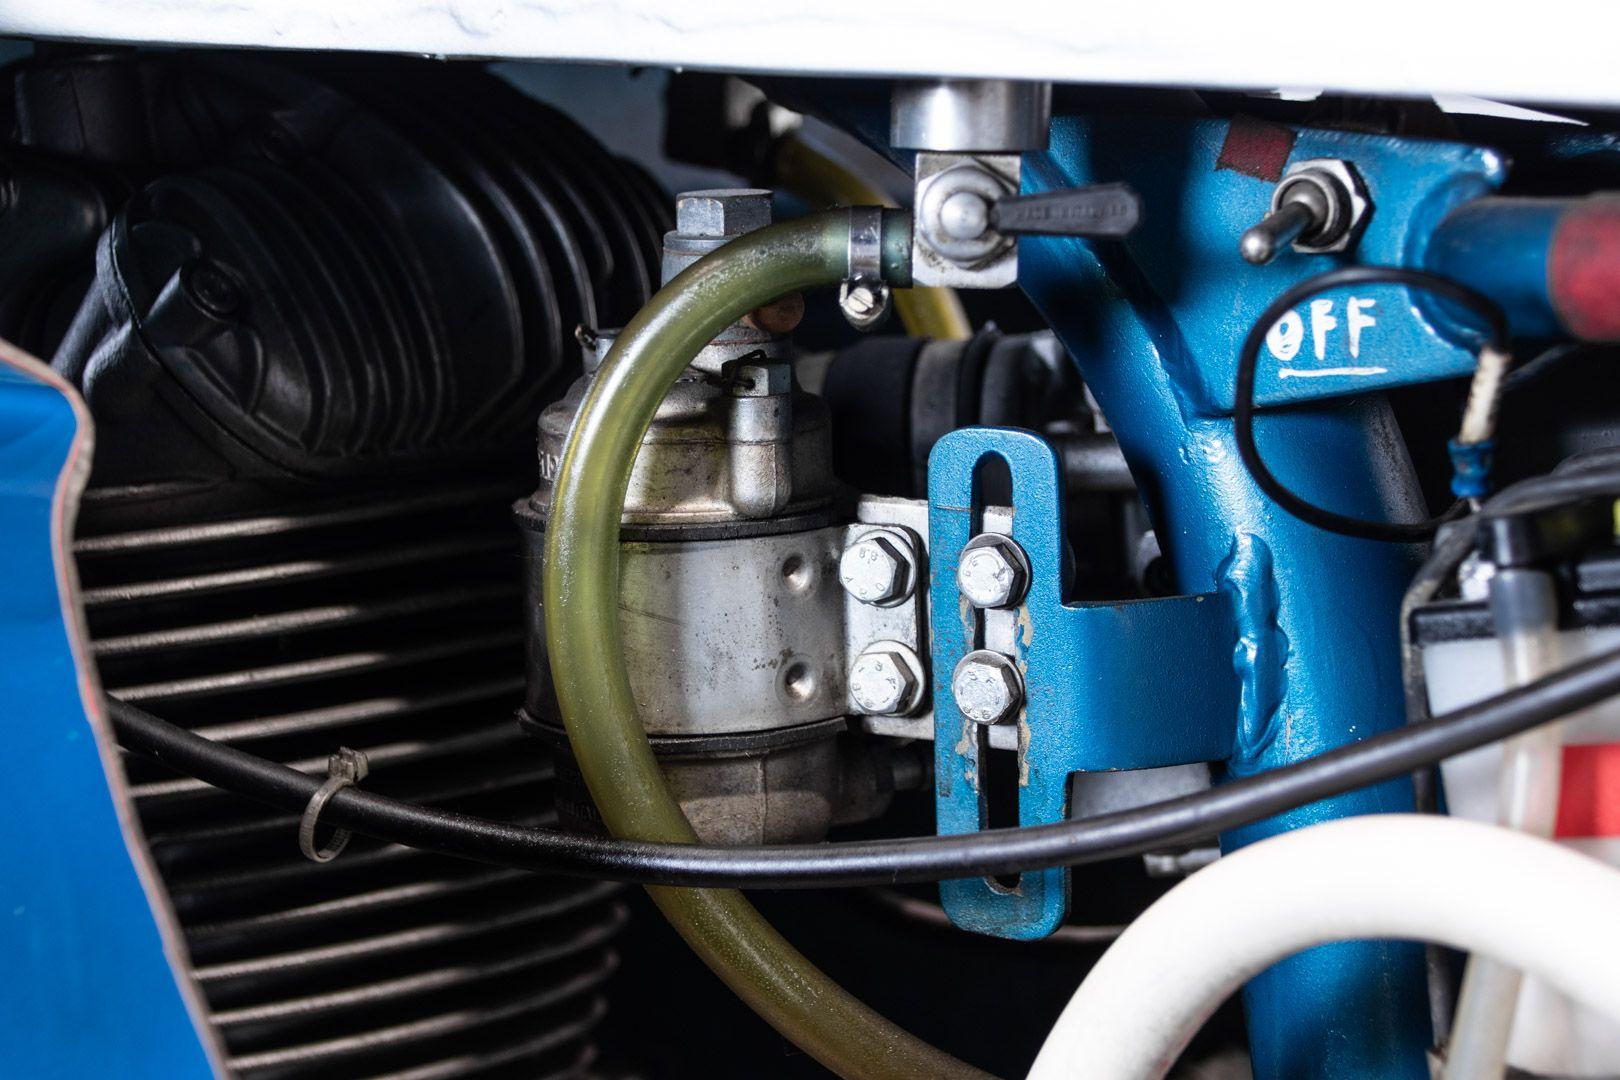 1960 Ducati Mach 1 Corsa NCR 82206